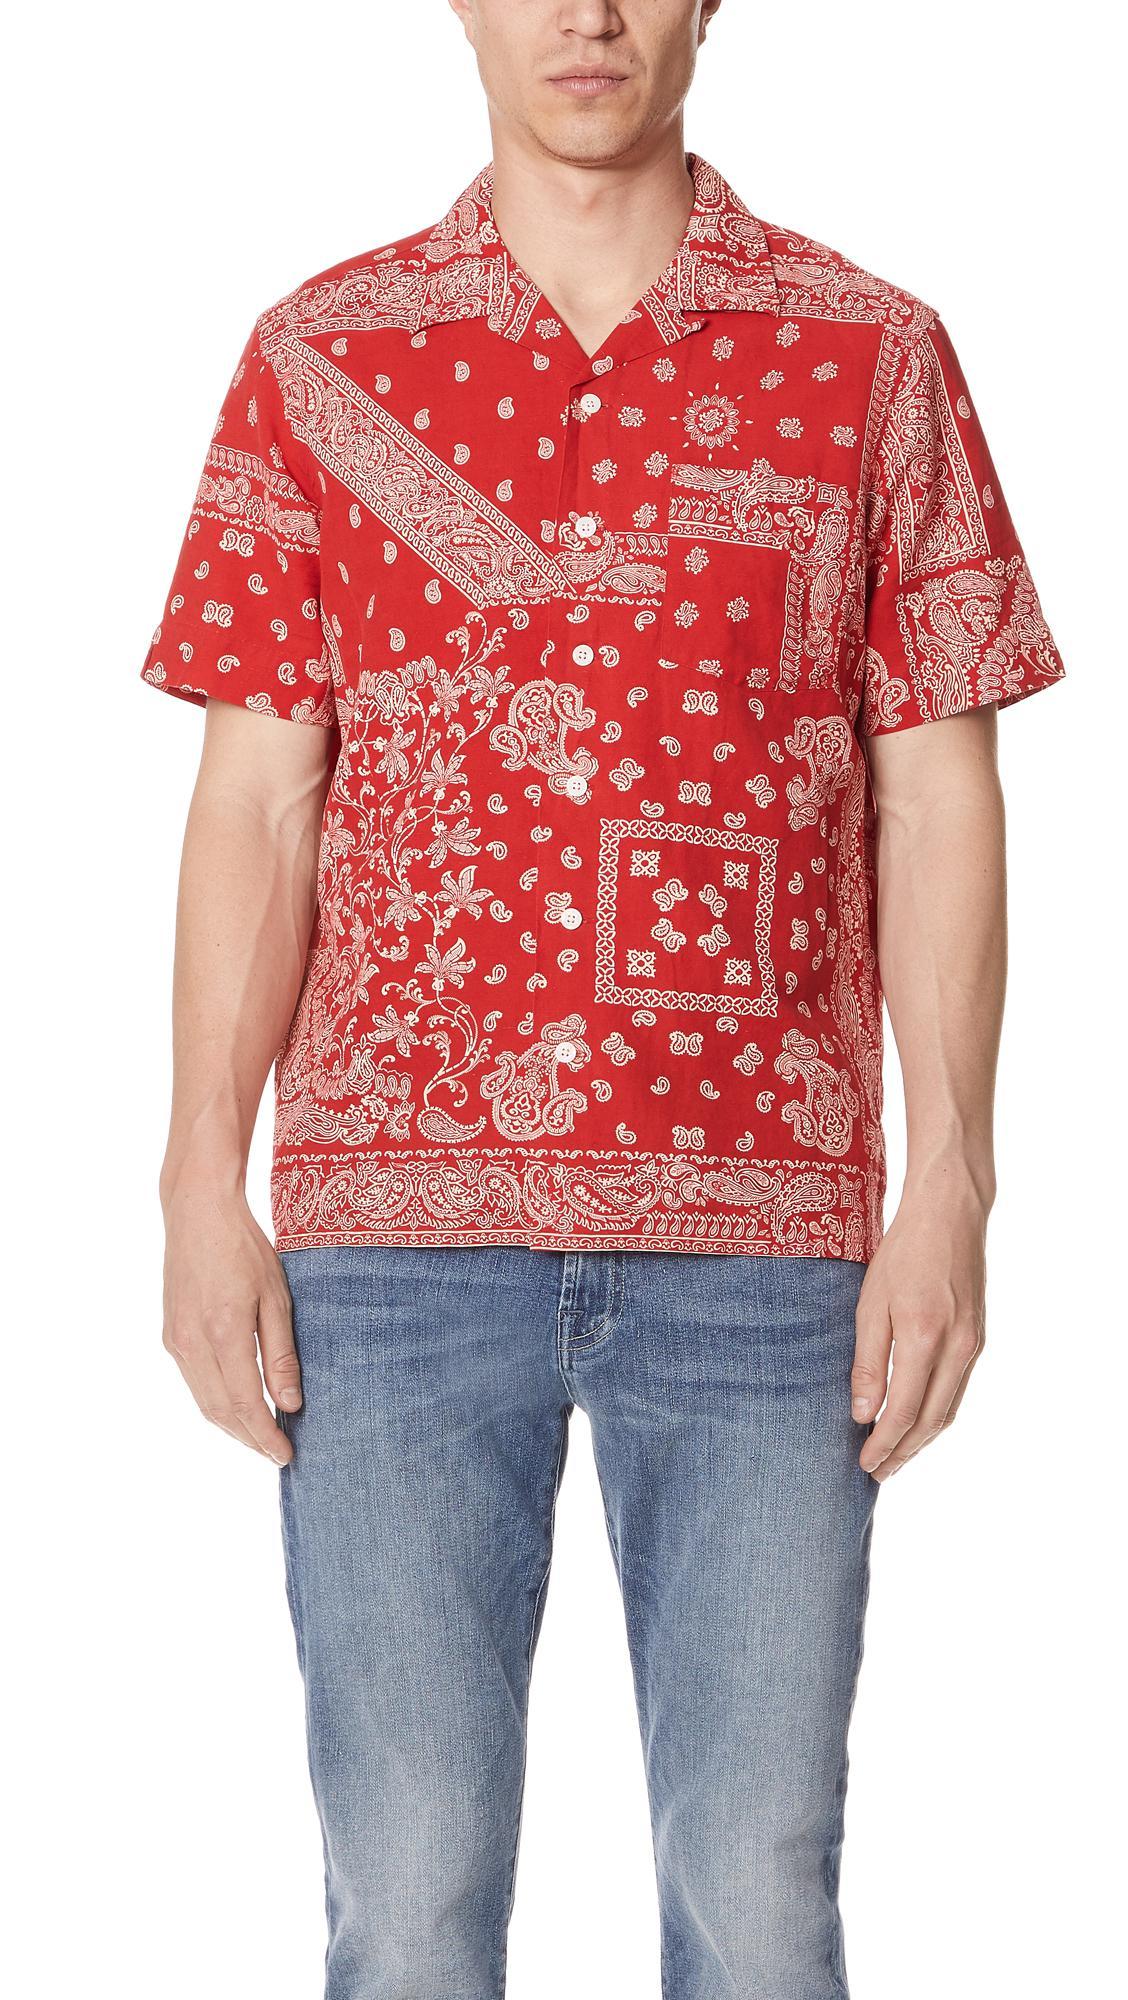 9cd9e86ec ... promo code for lyst polo ralph lauren bandana shirt in red for men  d852a f8f5a